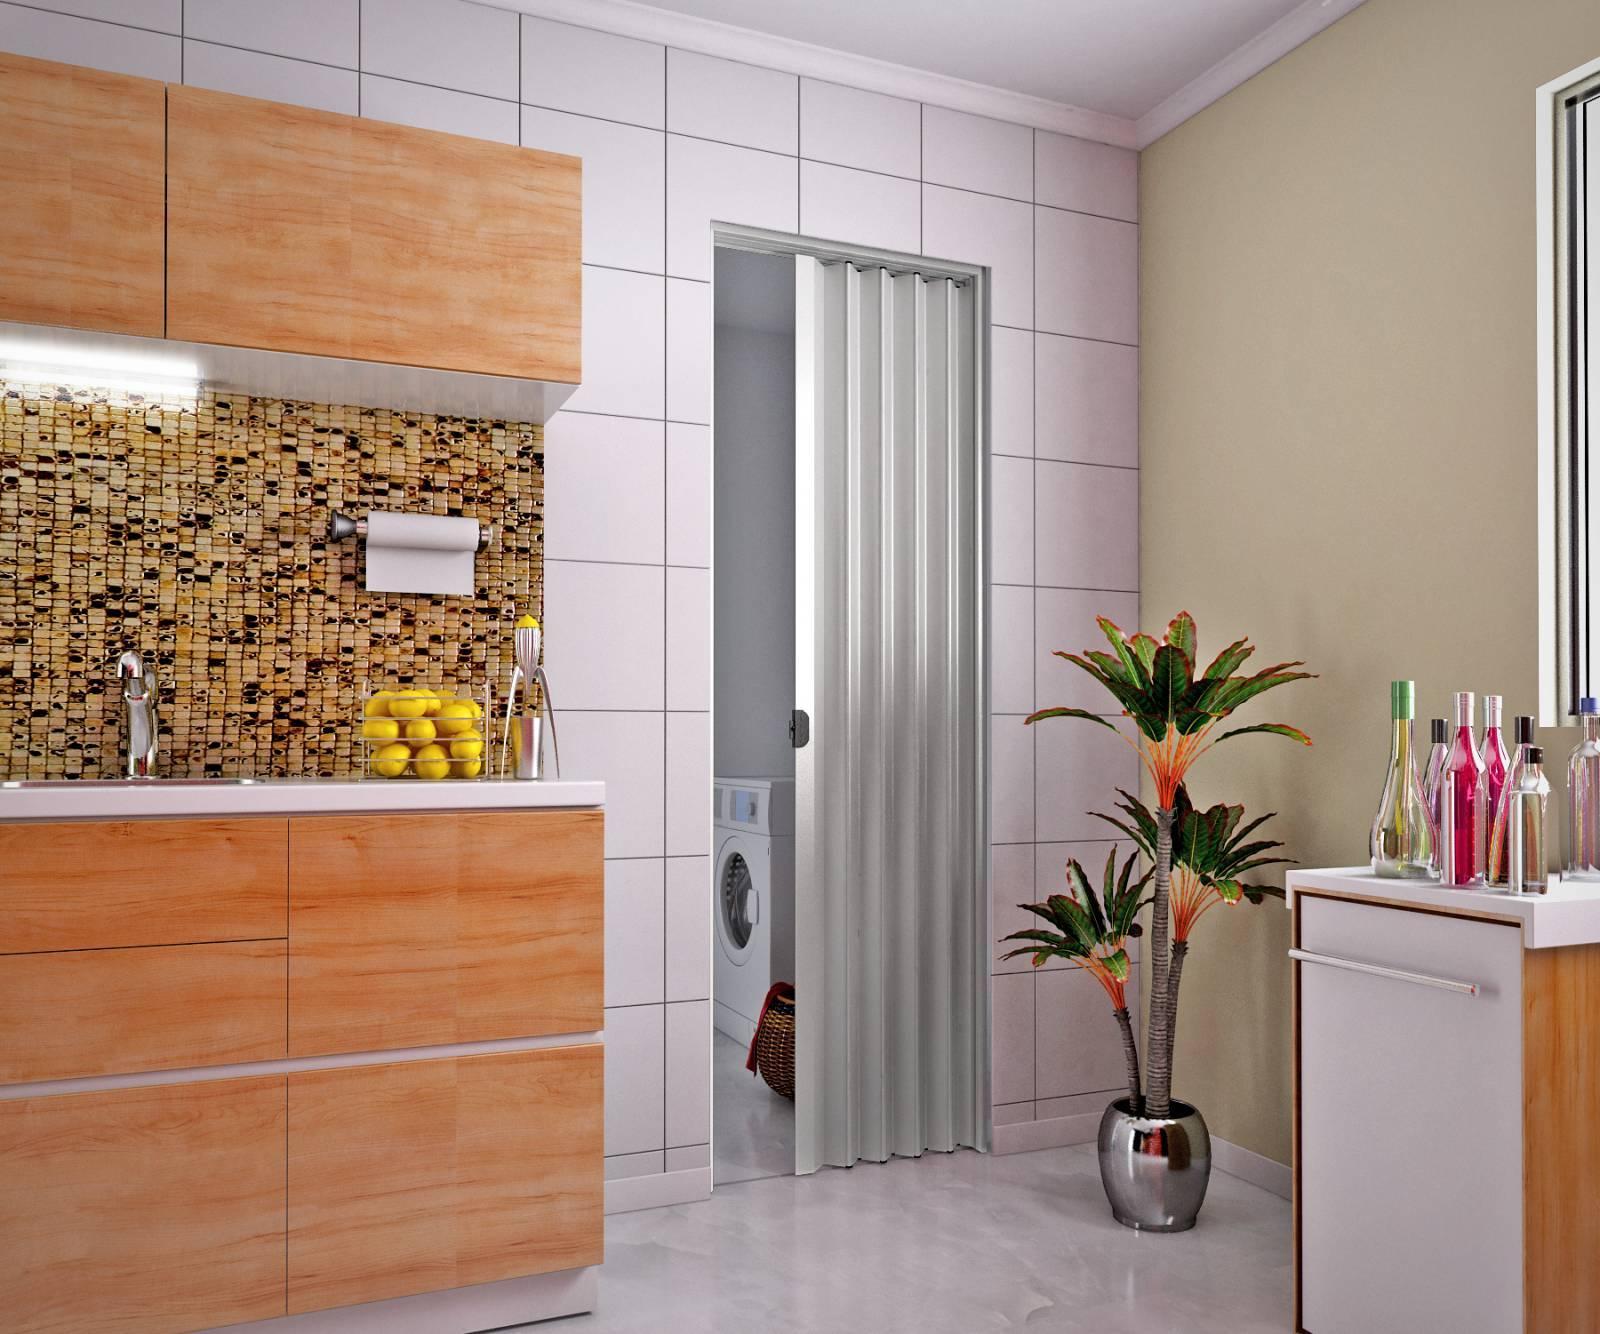 Porta Sanfonada De Pvc plasbil 2,10 x 80.cm Cinza - Casa Sul Materiais e Acabamento